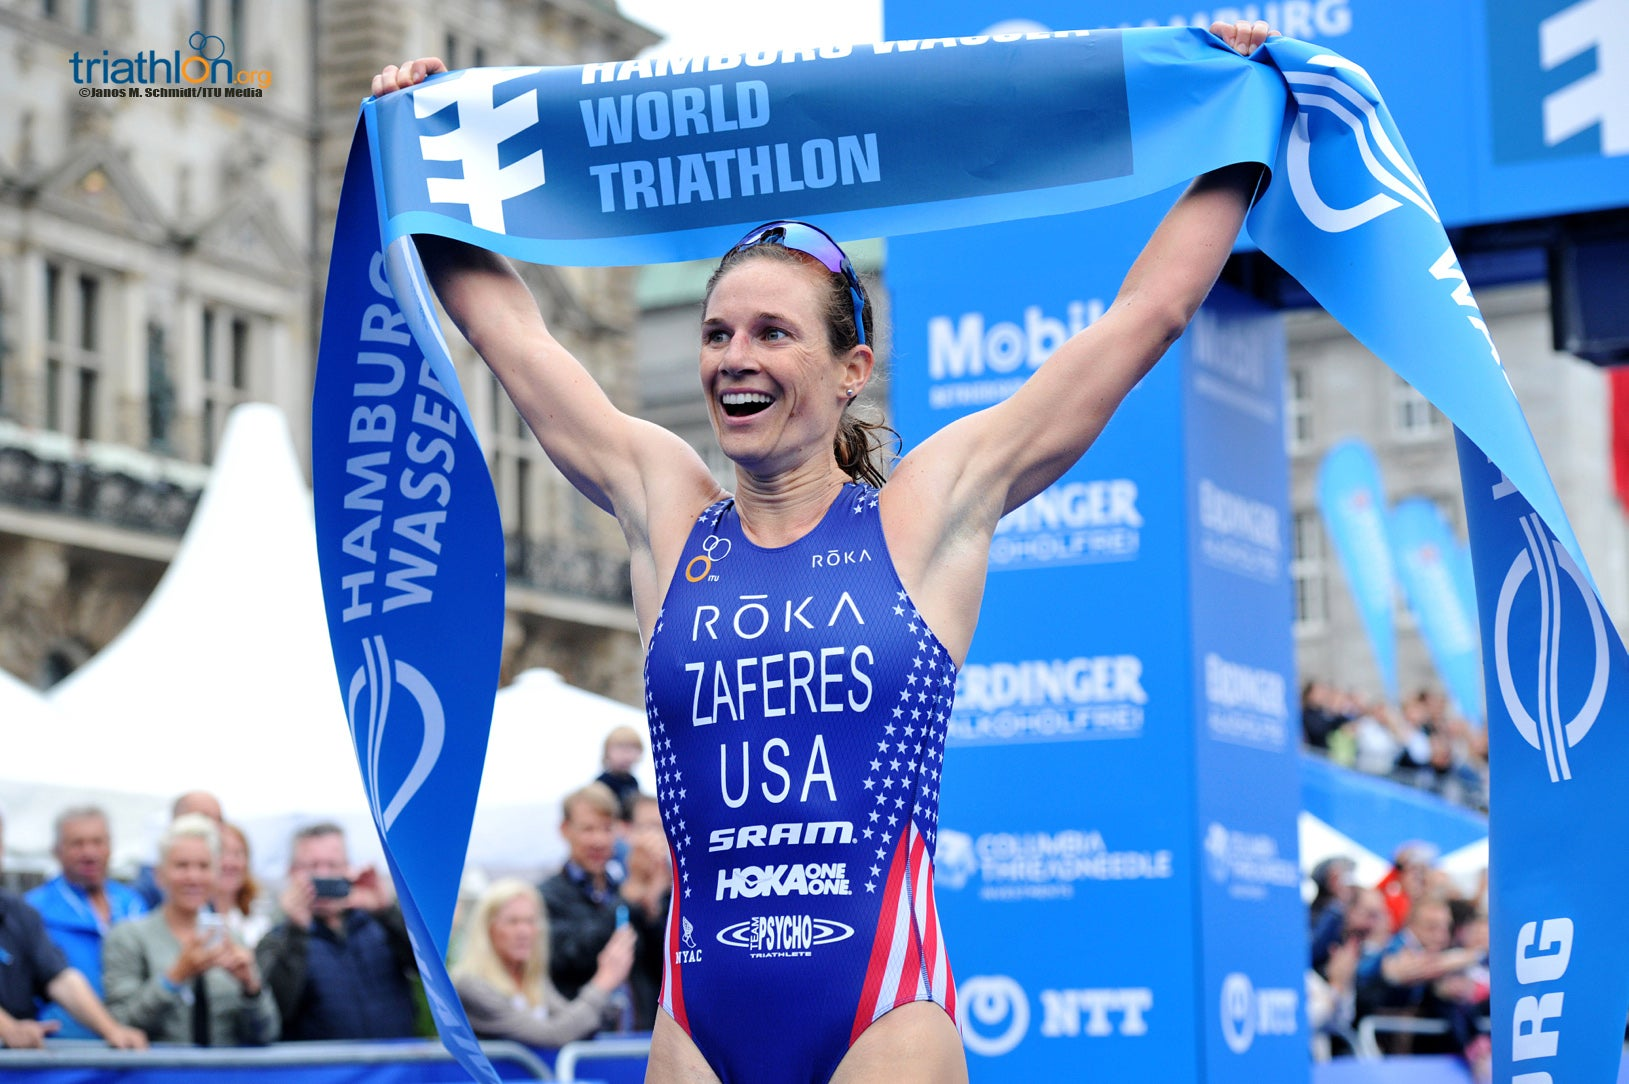 Photo: Triathlon.org